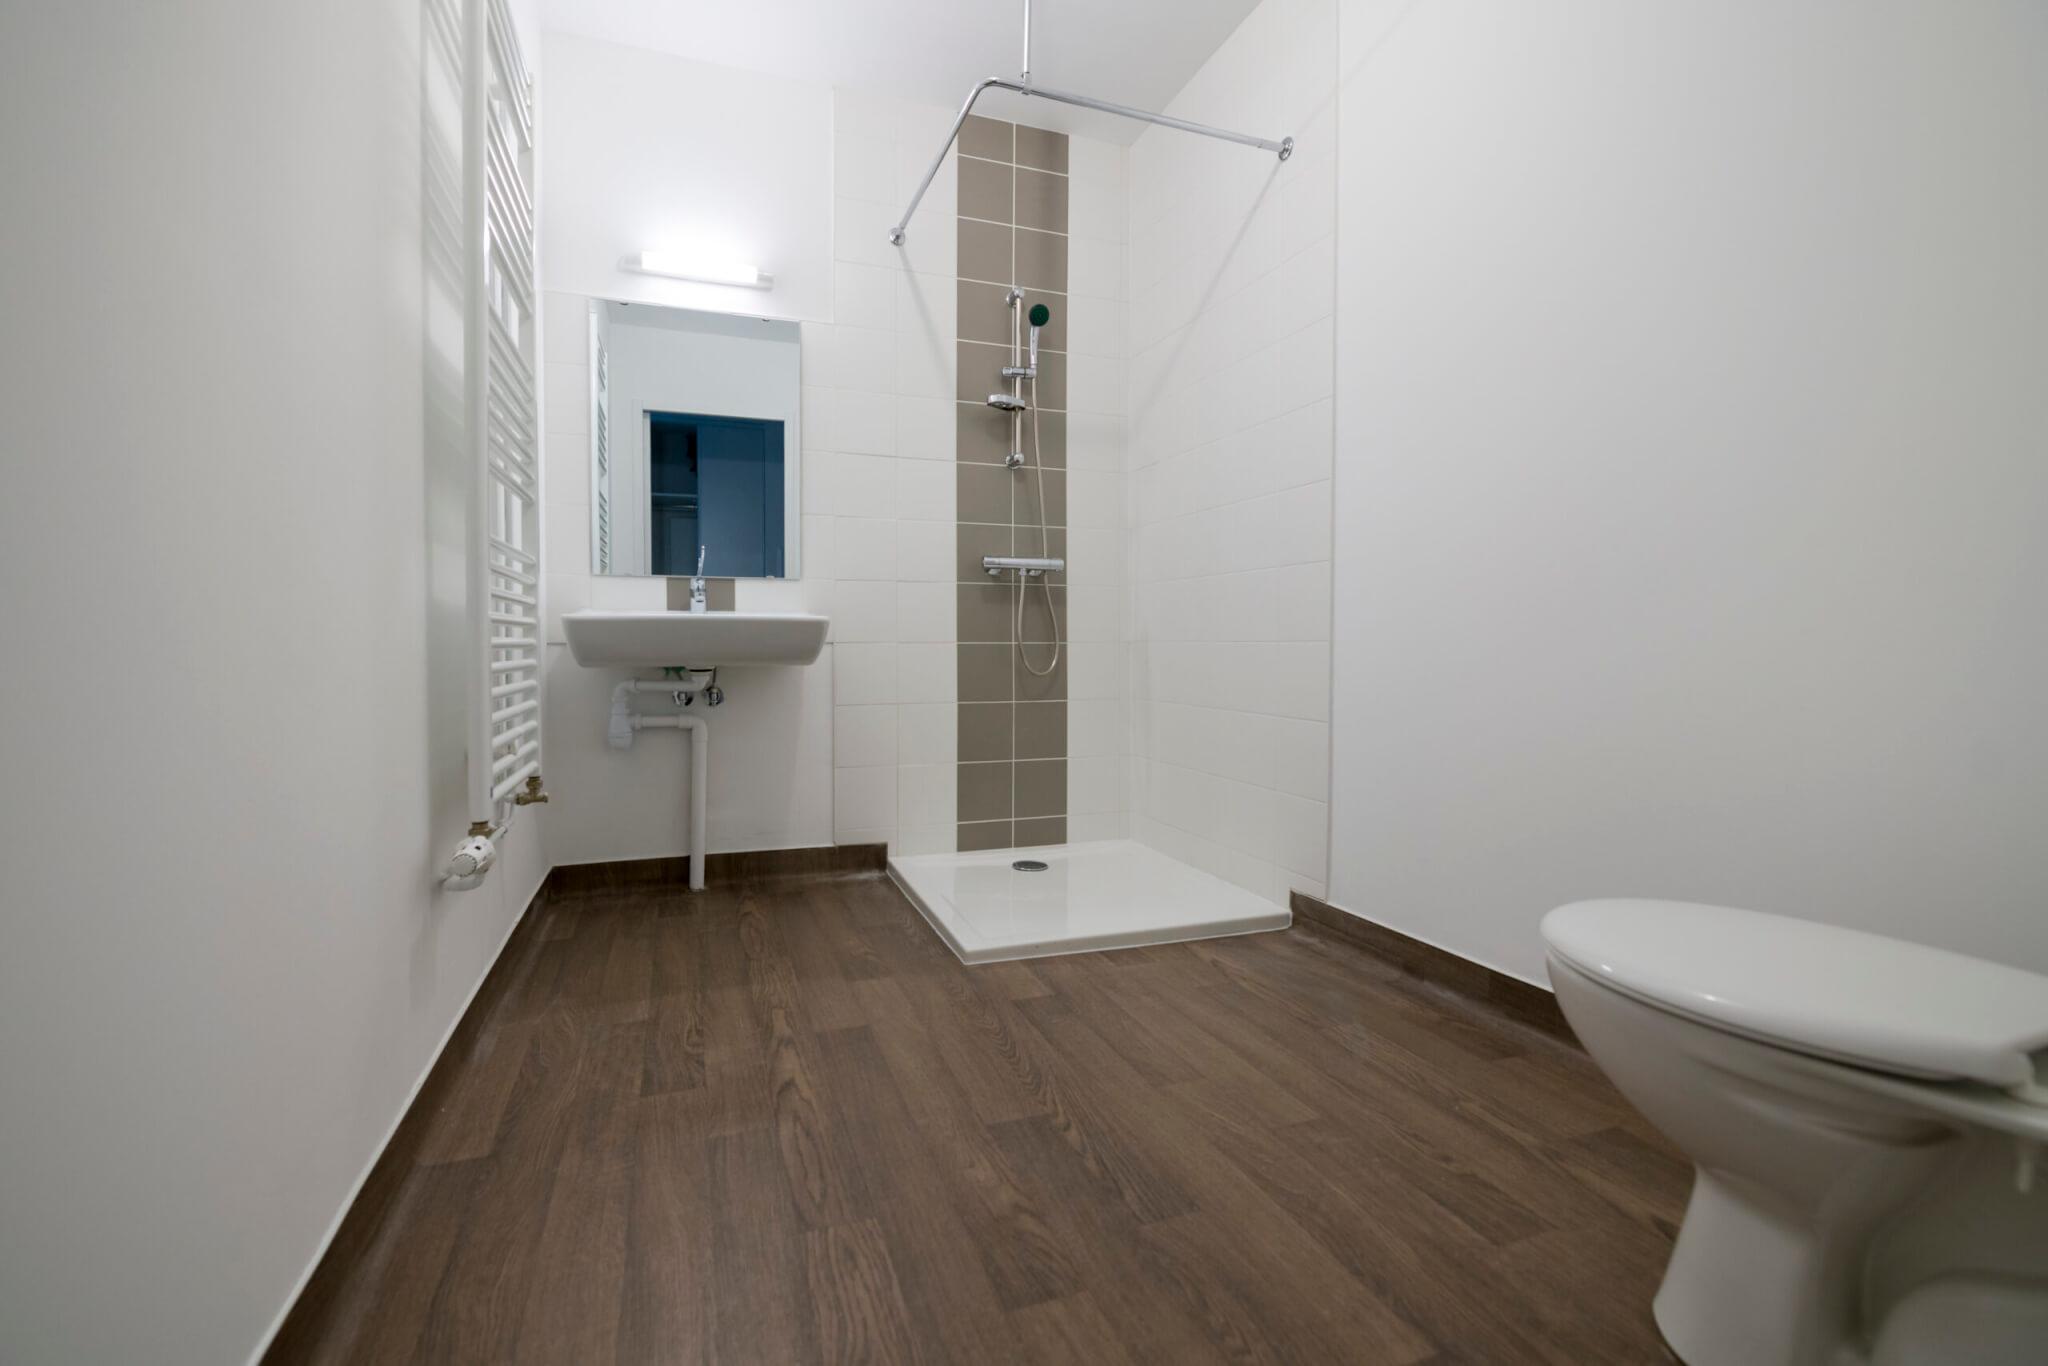 AAP_Logiest Pompey_salle de bain douche finie